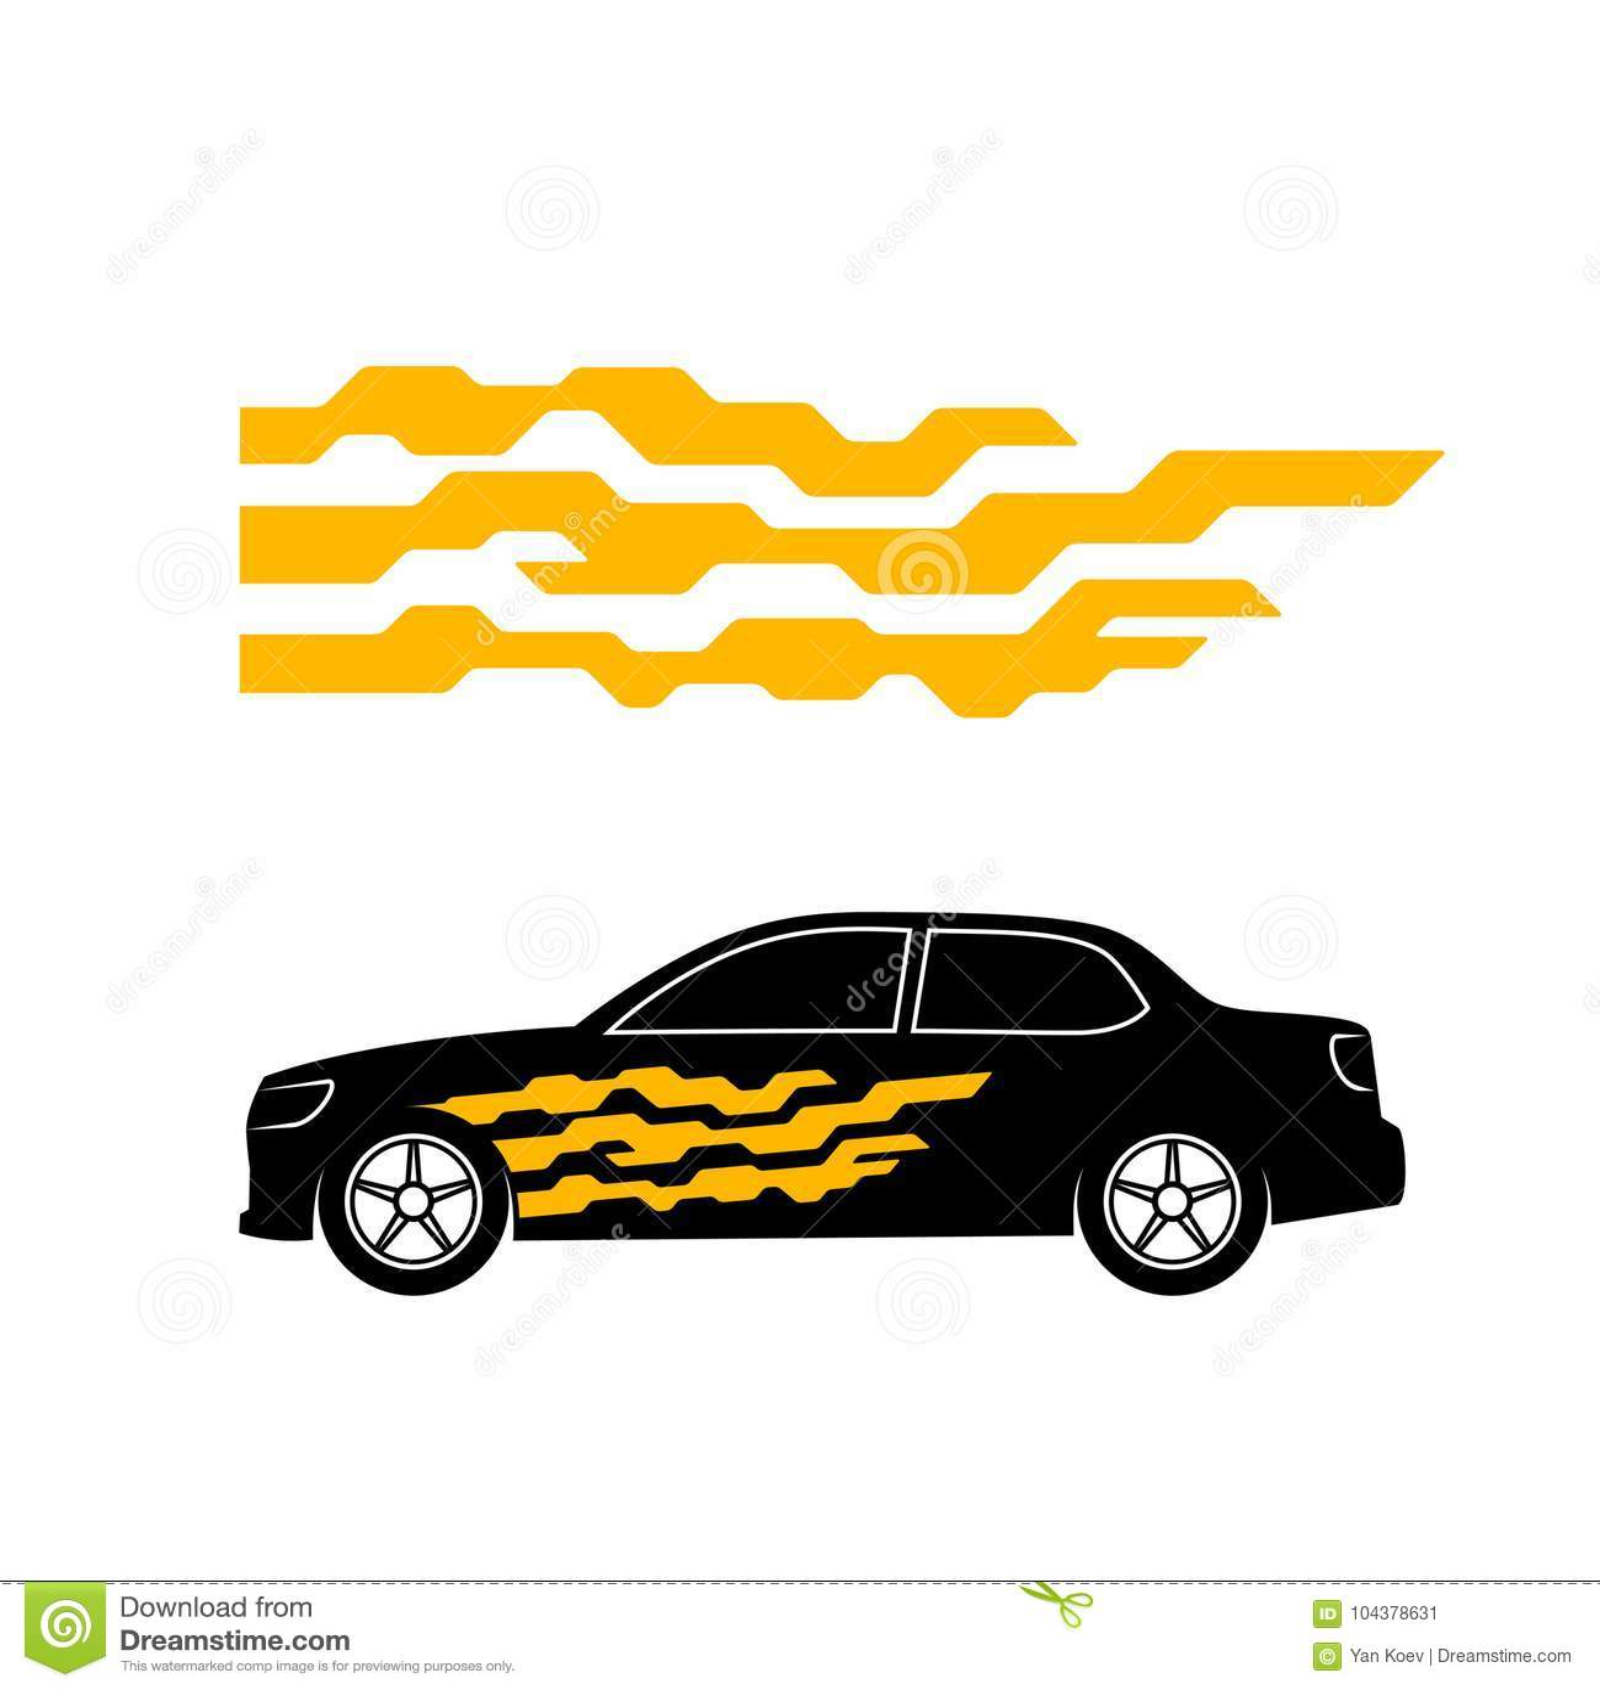 Car sticker side door decal. Tech geometric application.